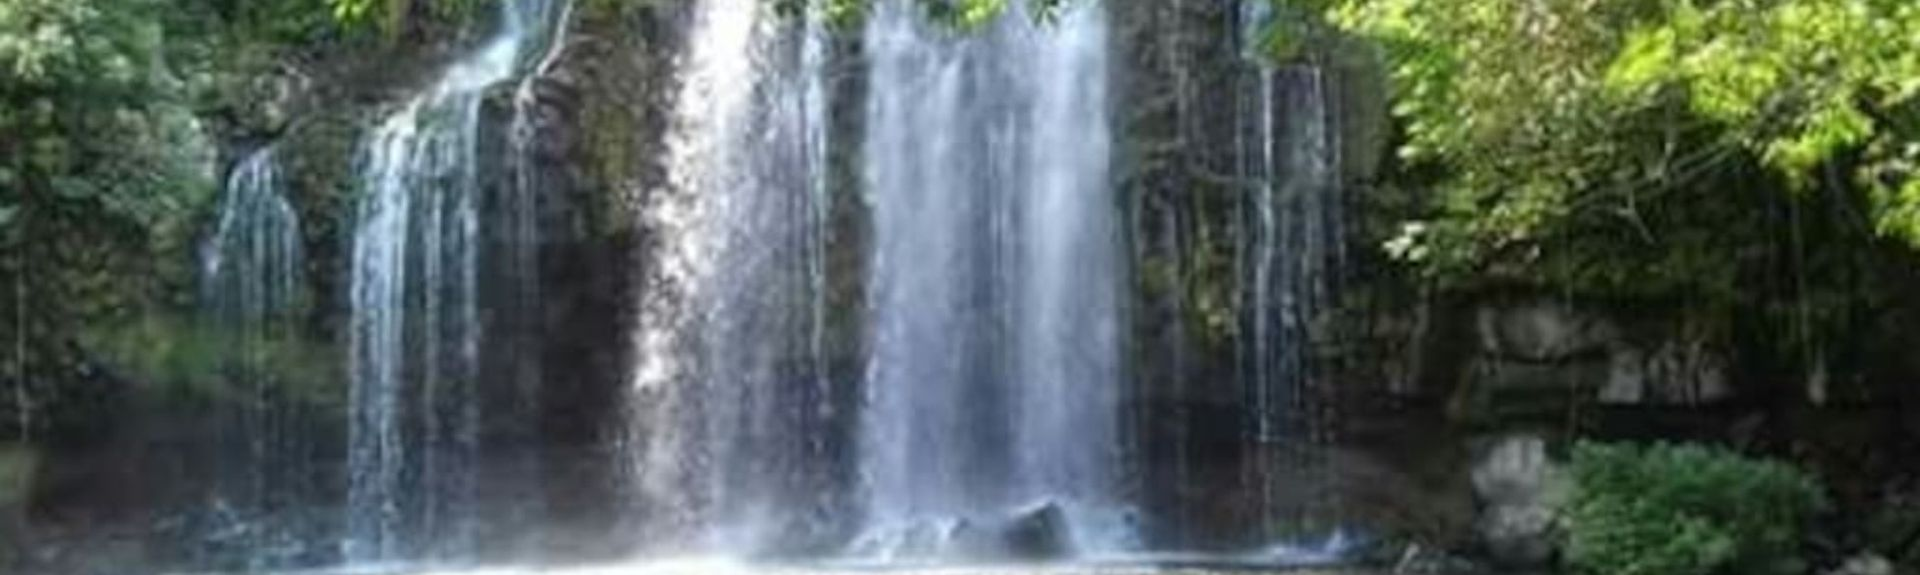 La Fortuna Waterfall, La Fortuna, Alajuela (province), Costa Rica